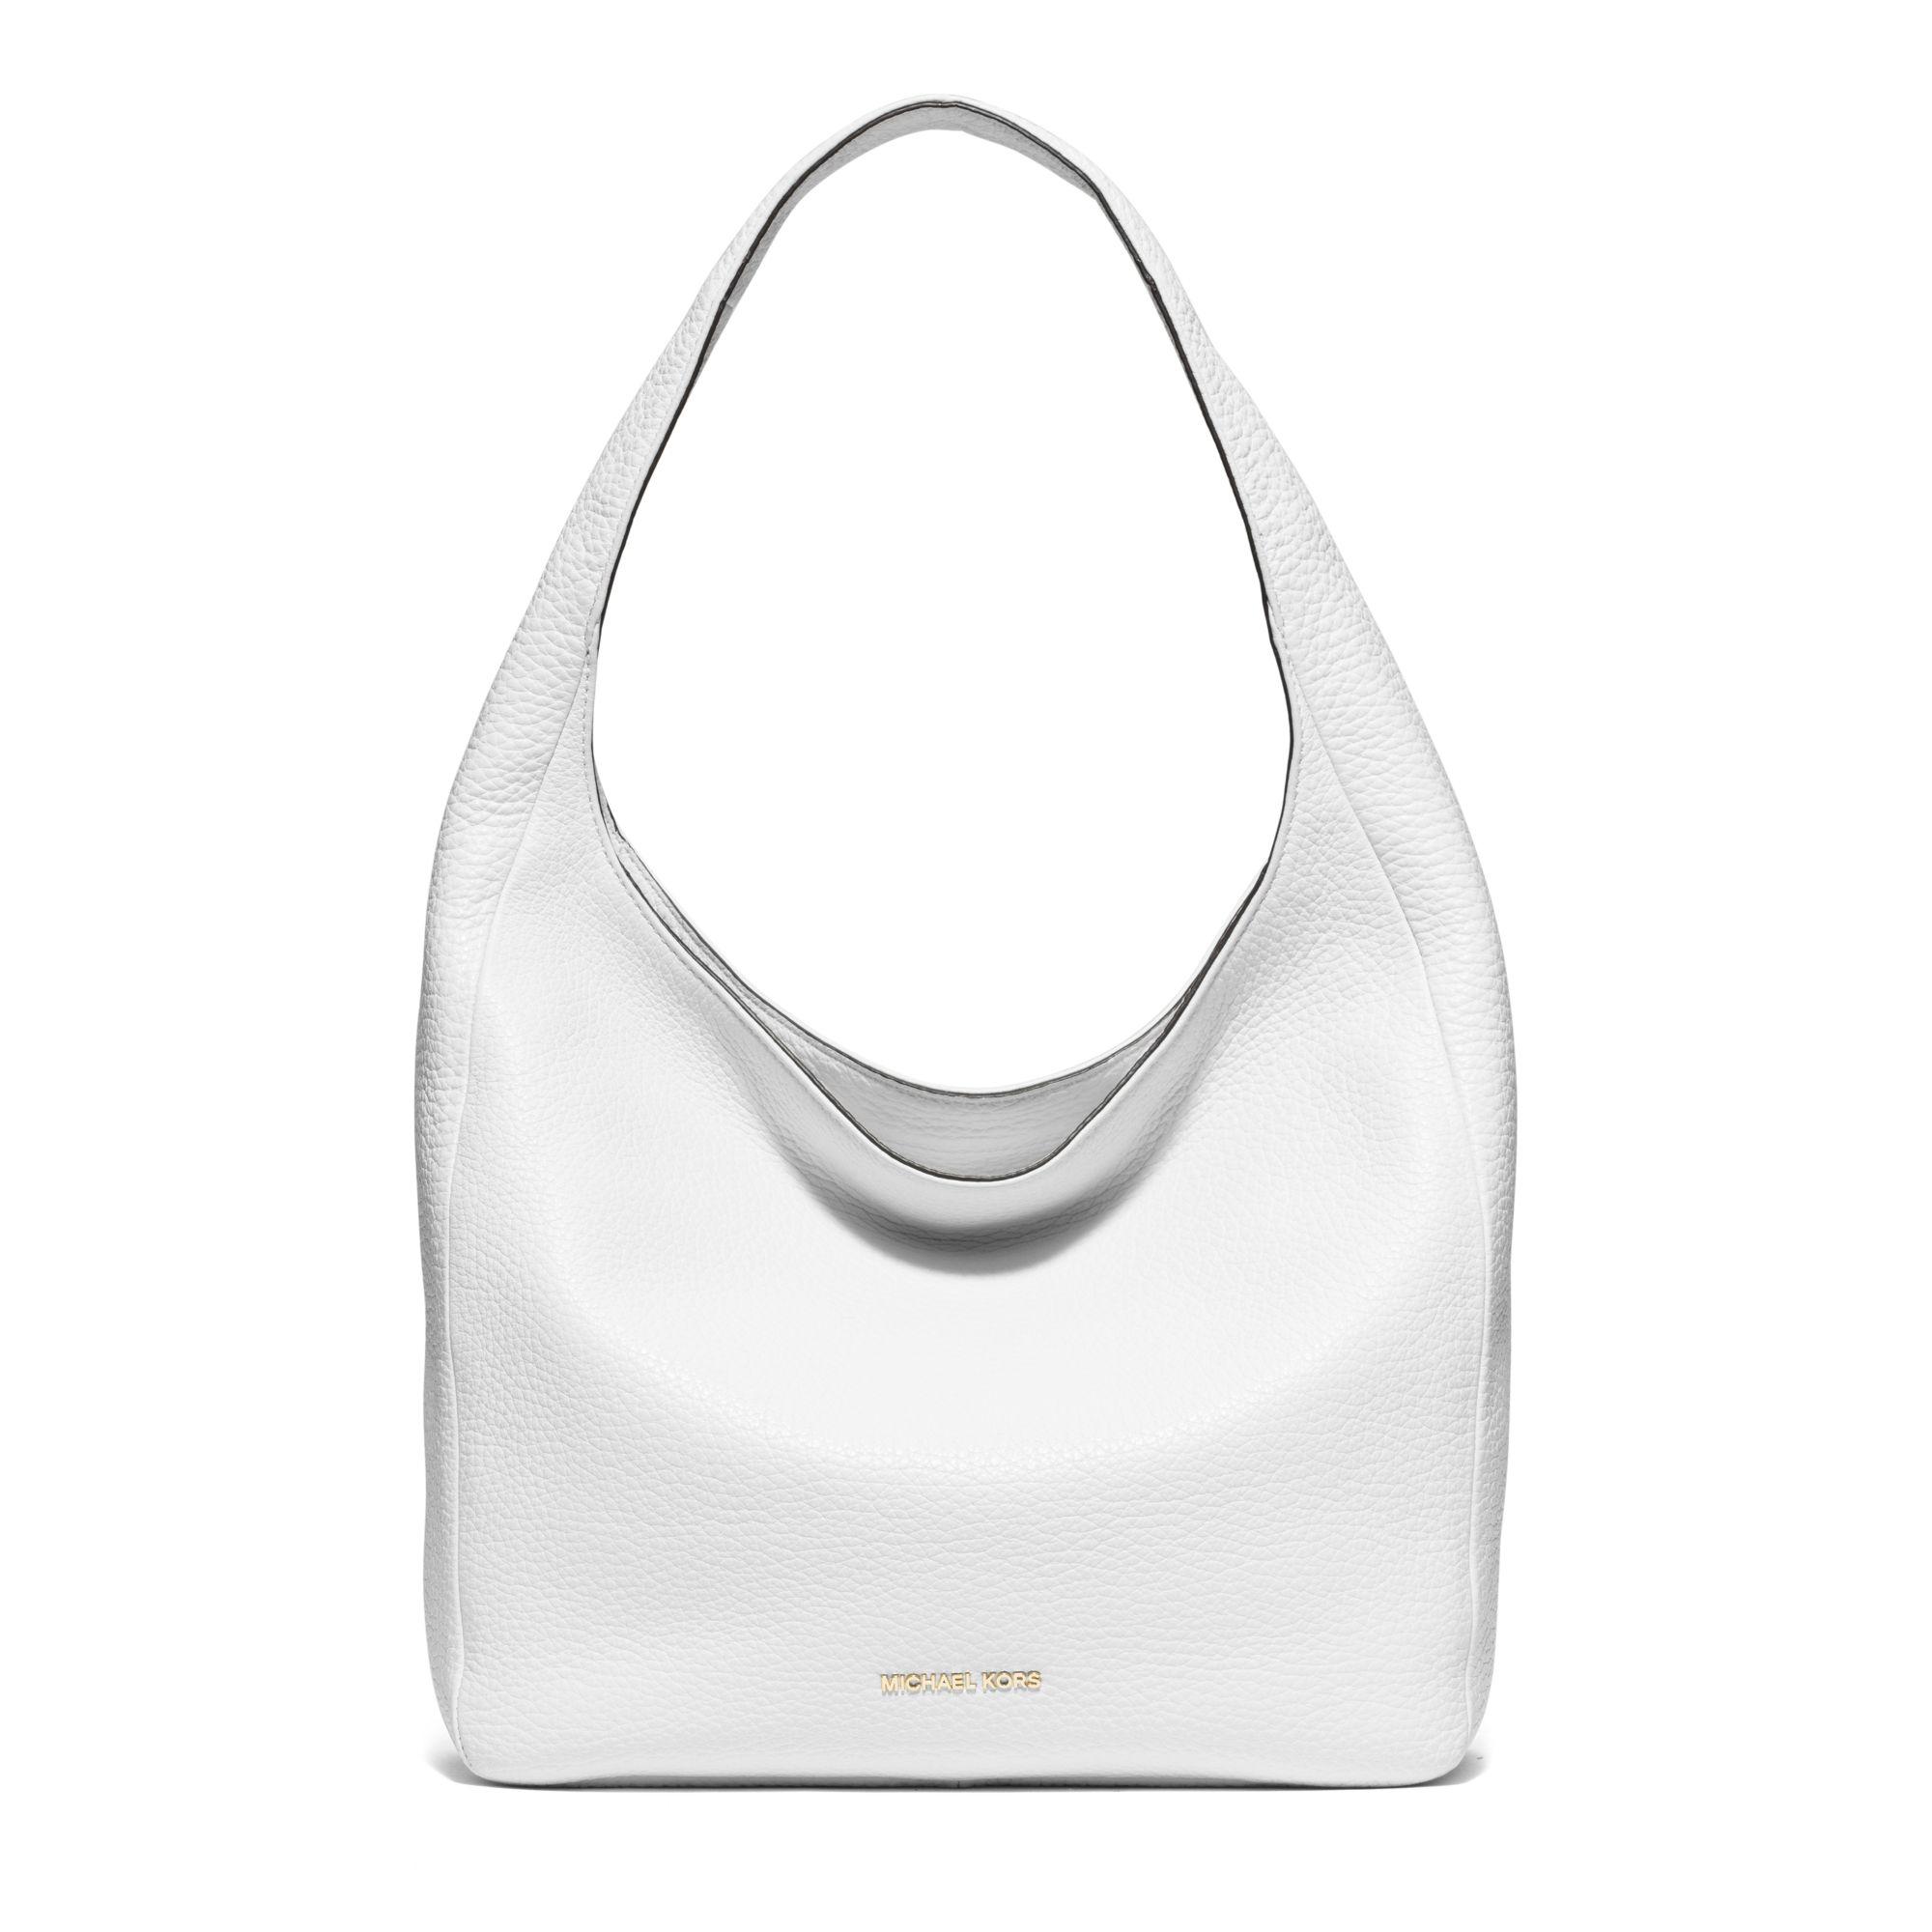 b69f73f61f08 Lyst - Michael Kors Lena Large Leather Shoulder Bag in White